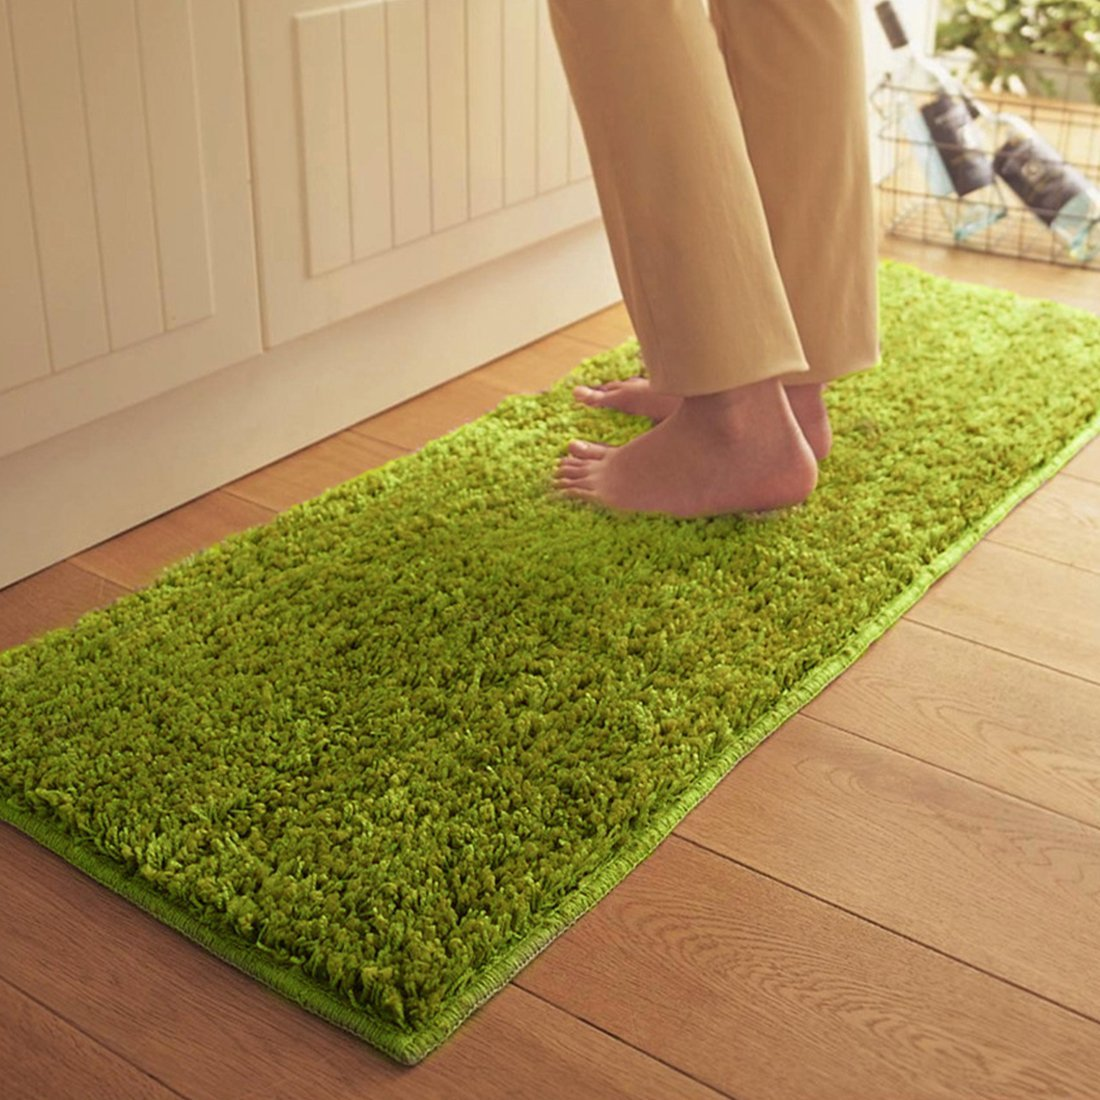 JTENGYAO Non-slip Chenille Fabric Shag Bedroom Kitchen Sofa Bathroom Mat-15.7 x 23.6 Inch